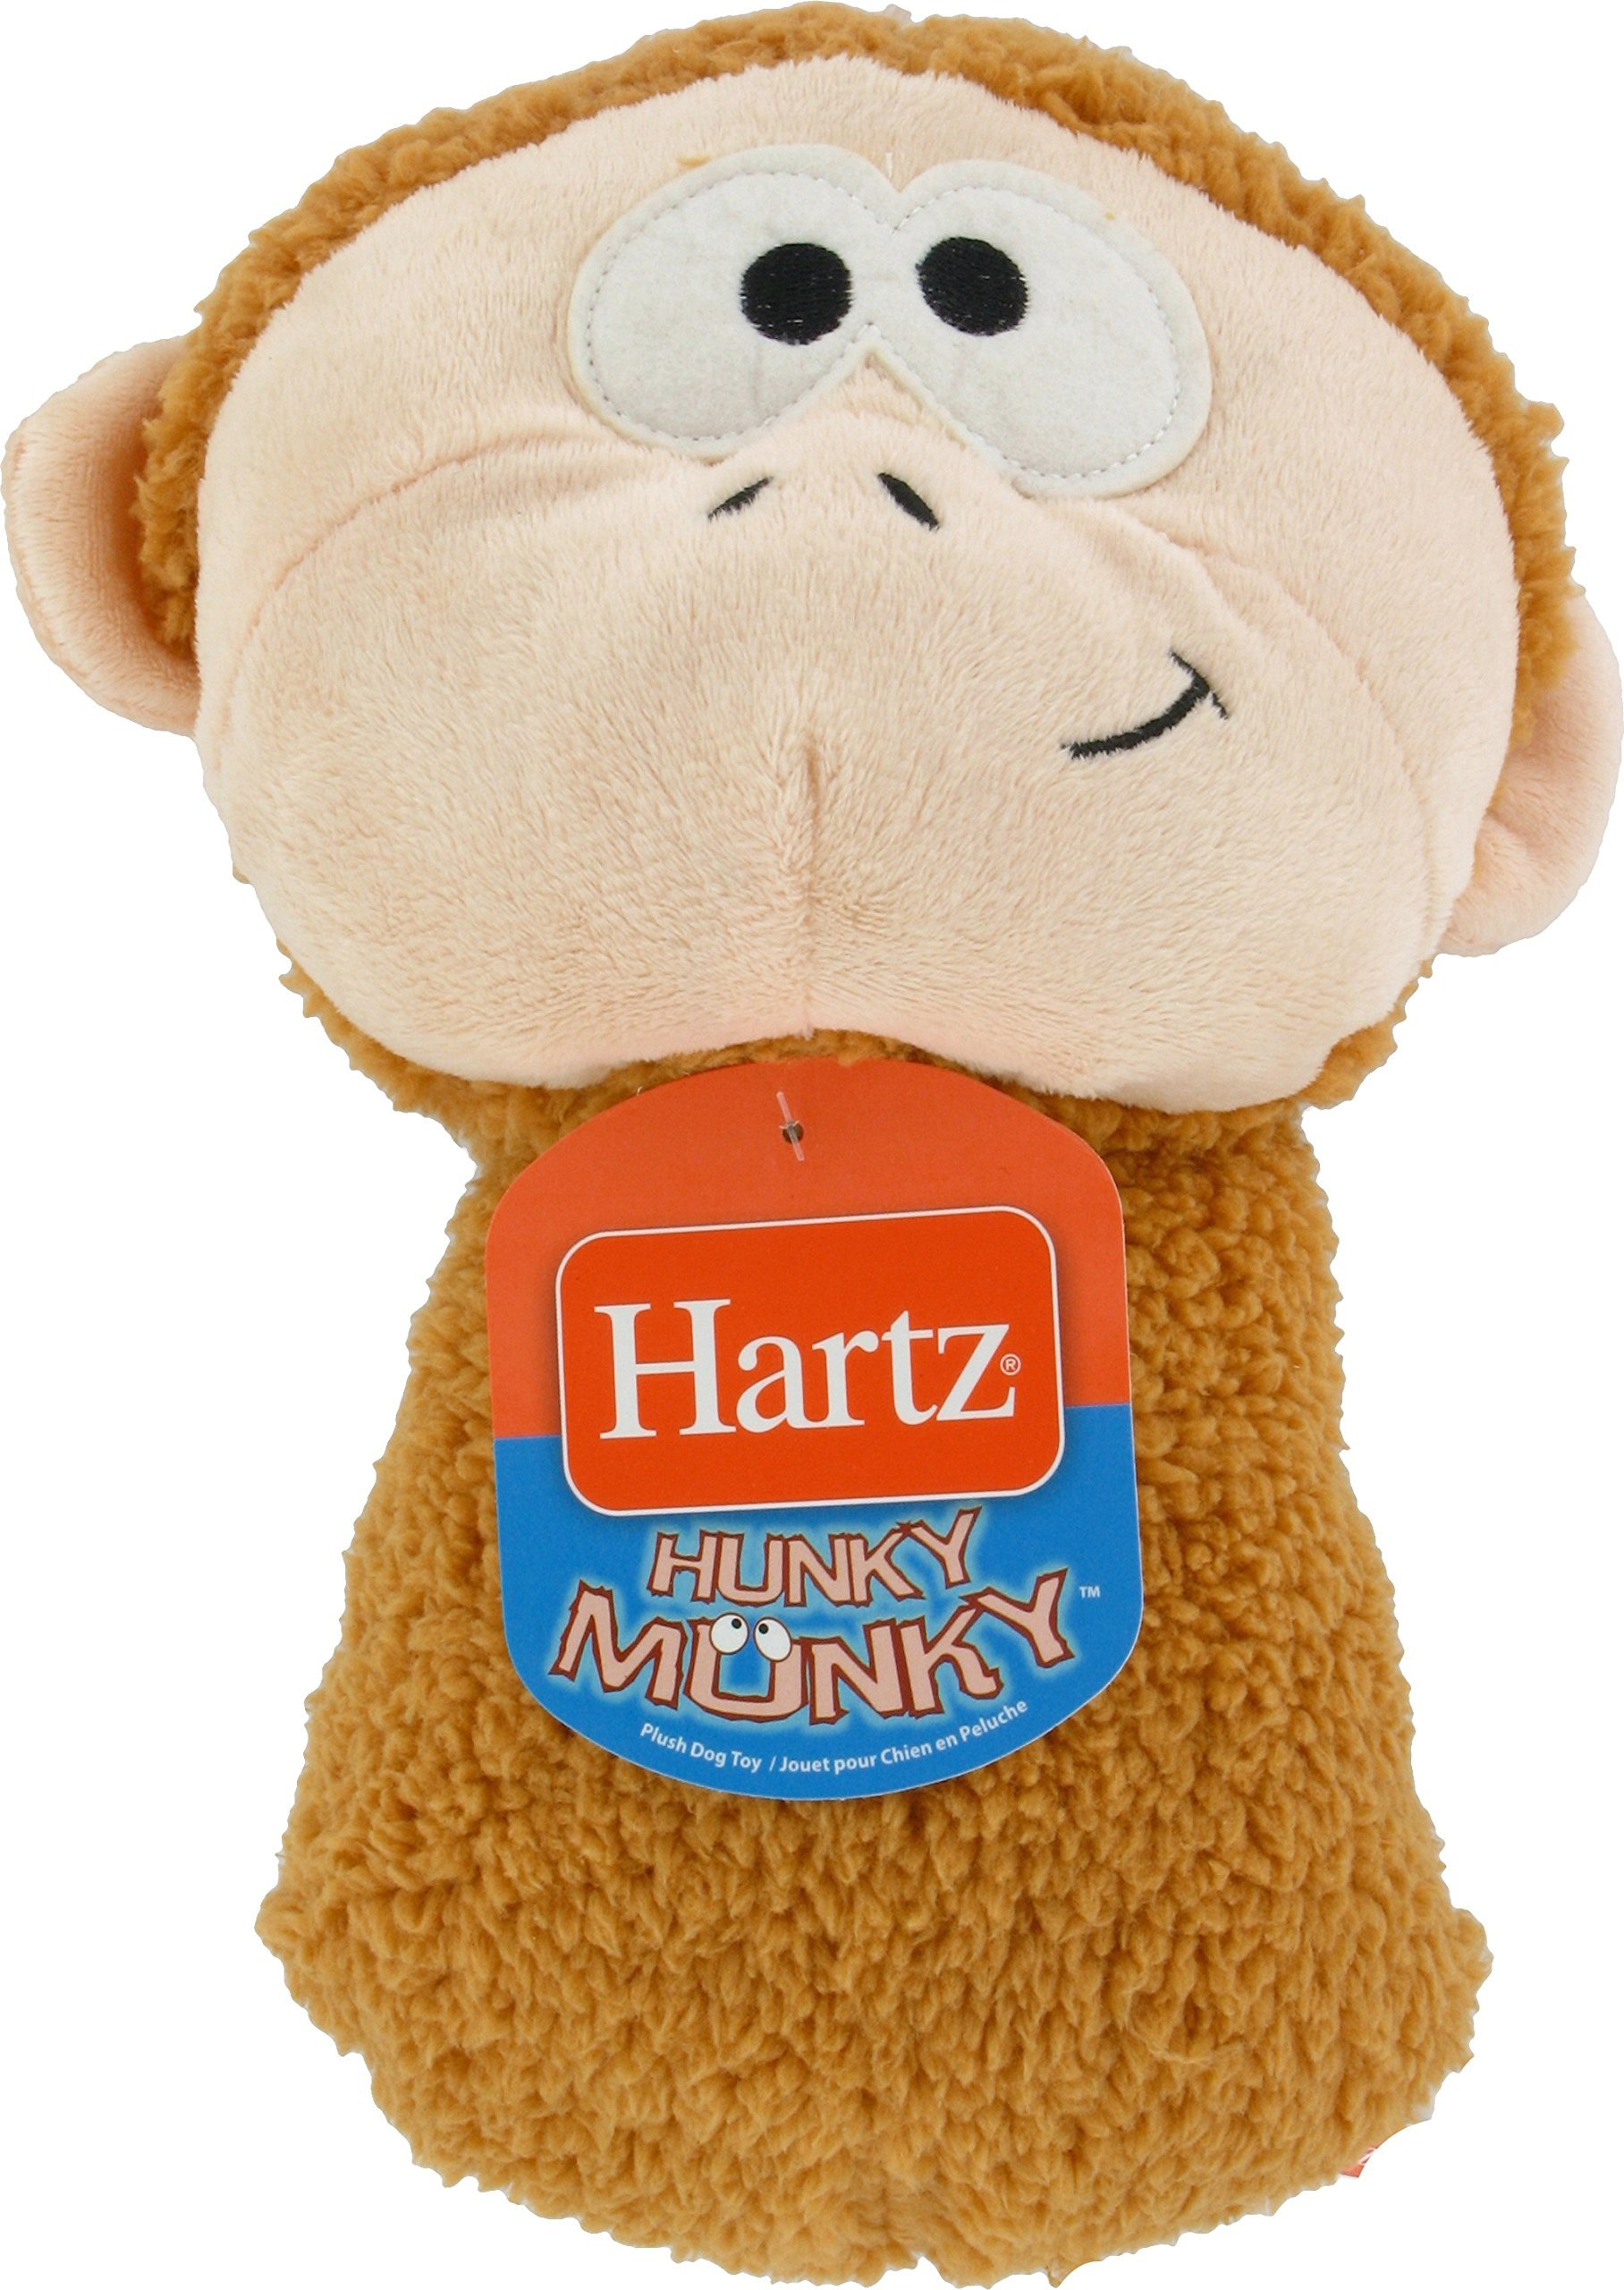 HARTZ Hunky Munky Plush Dog Toy (Colors Vary)